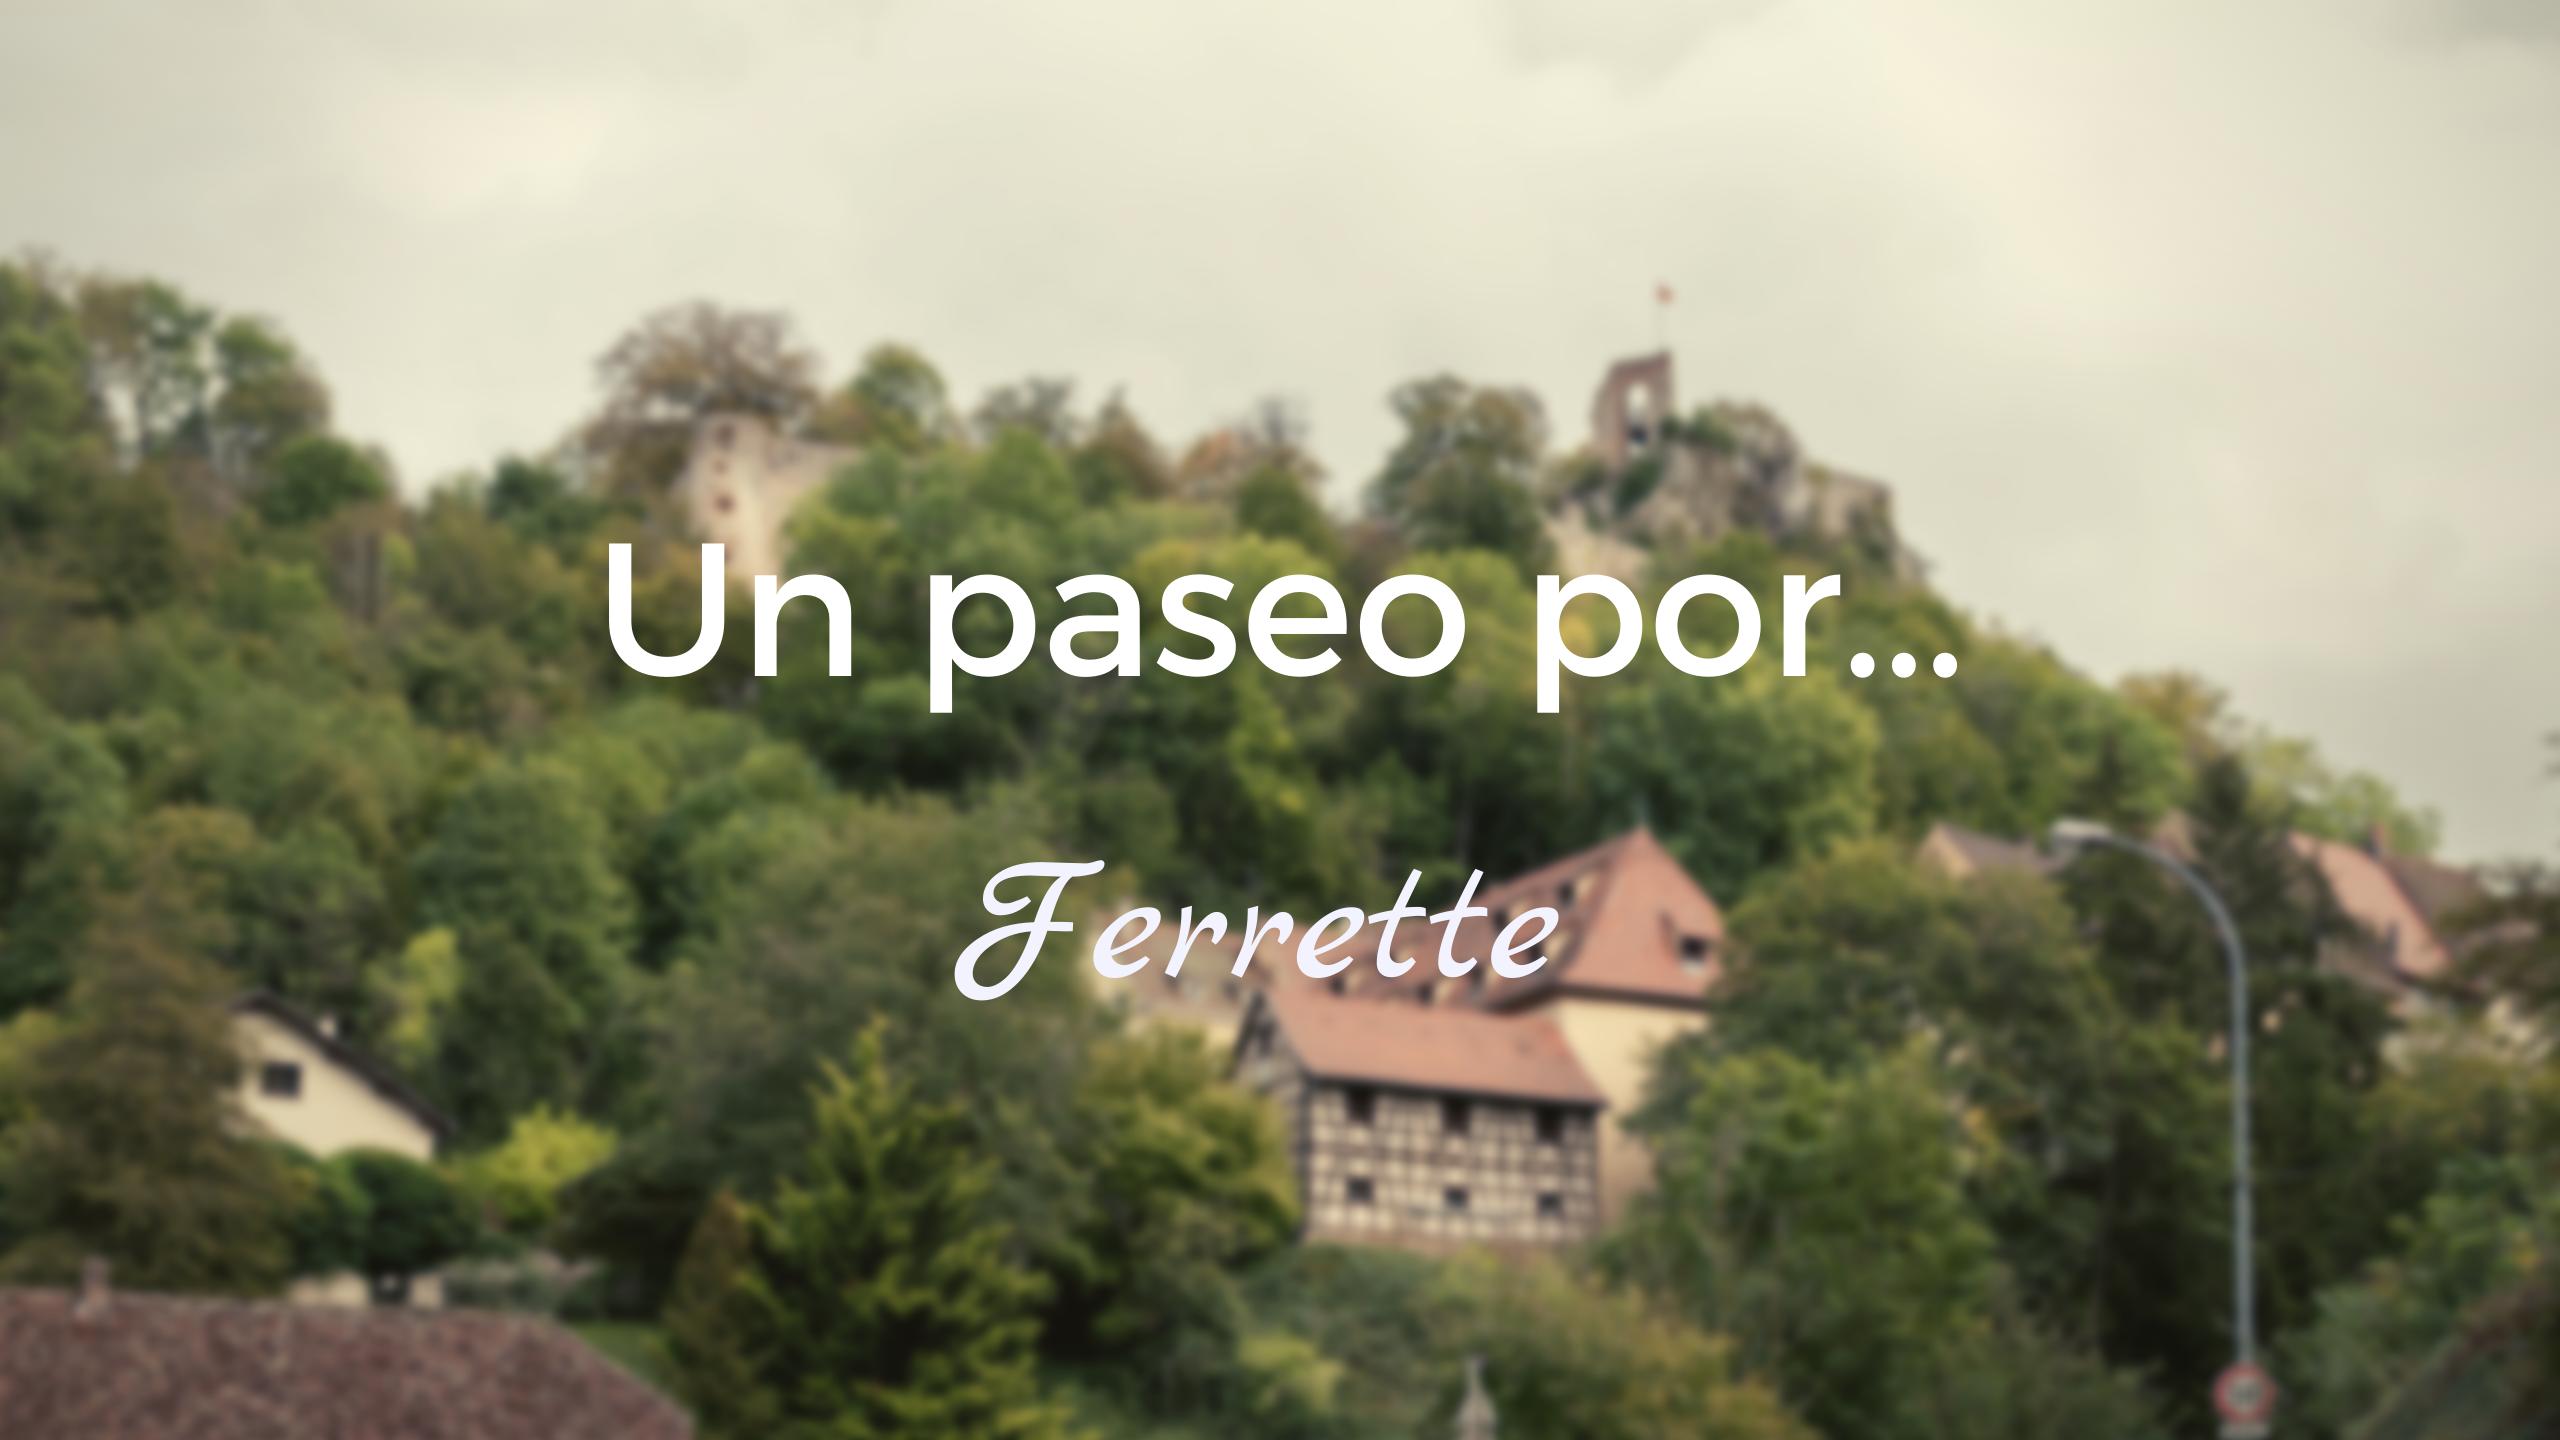 Ferrette y su castillo